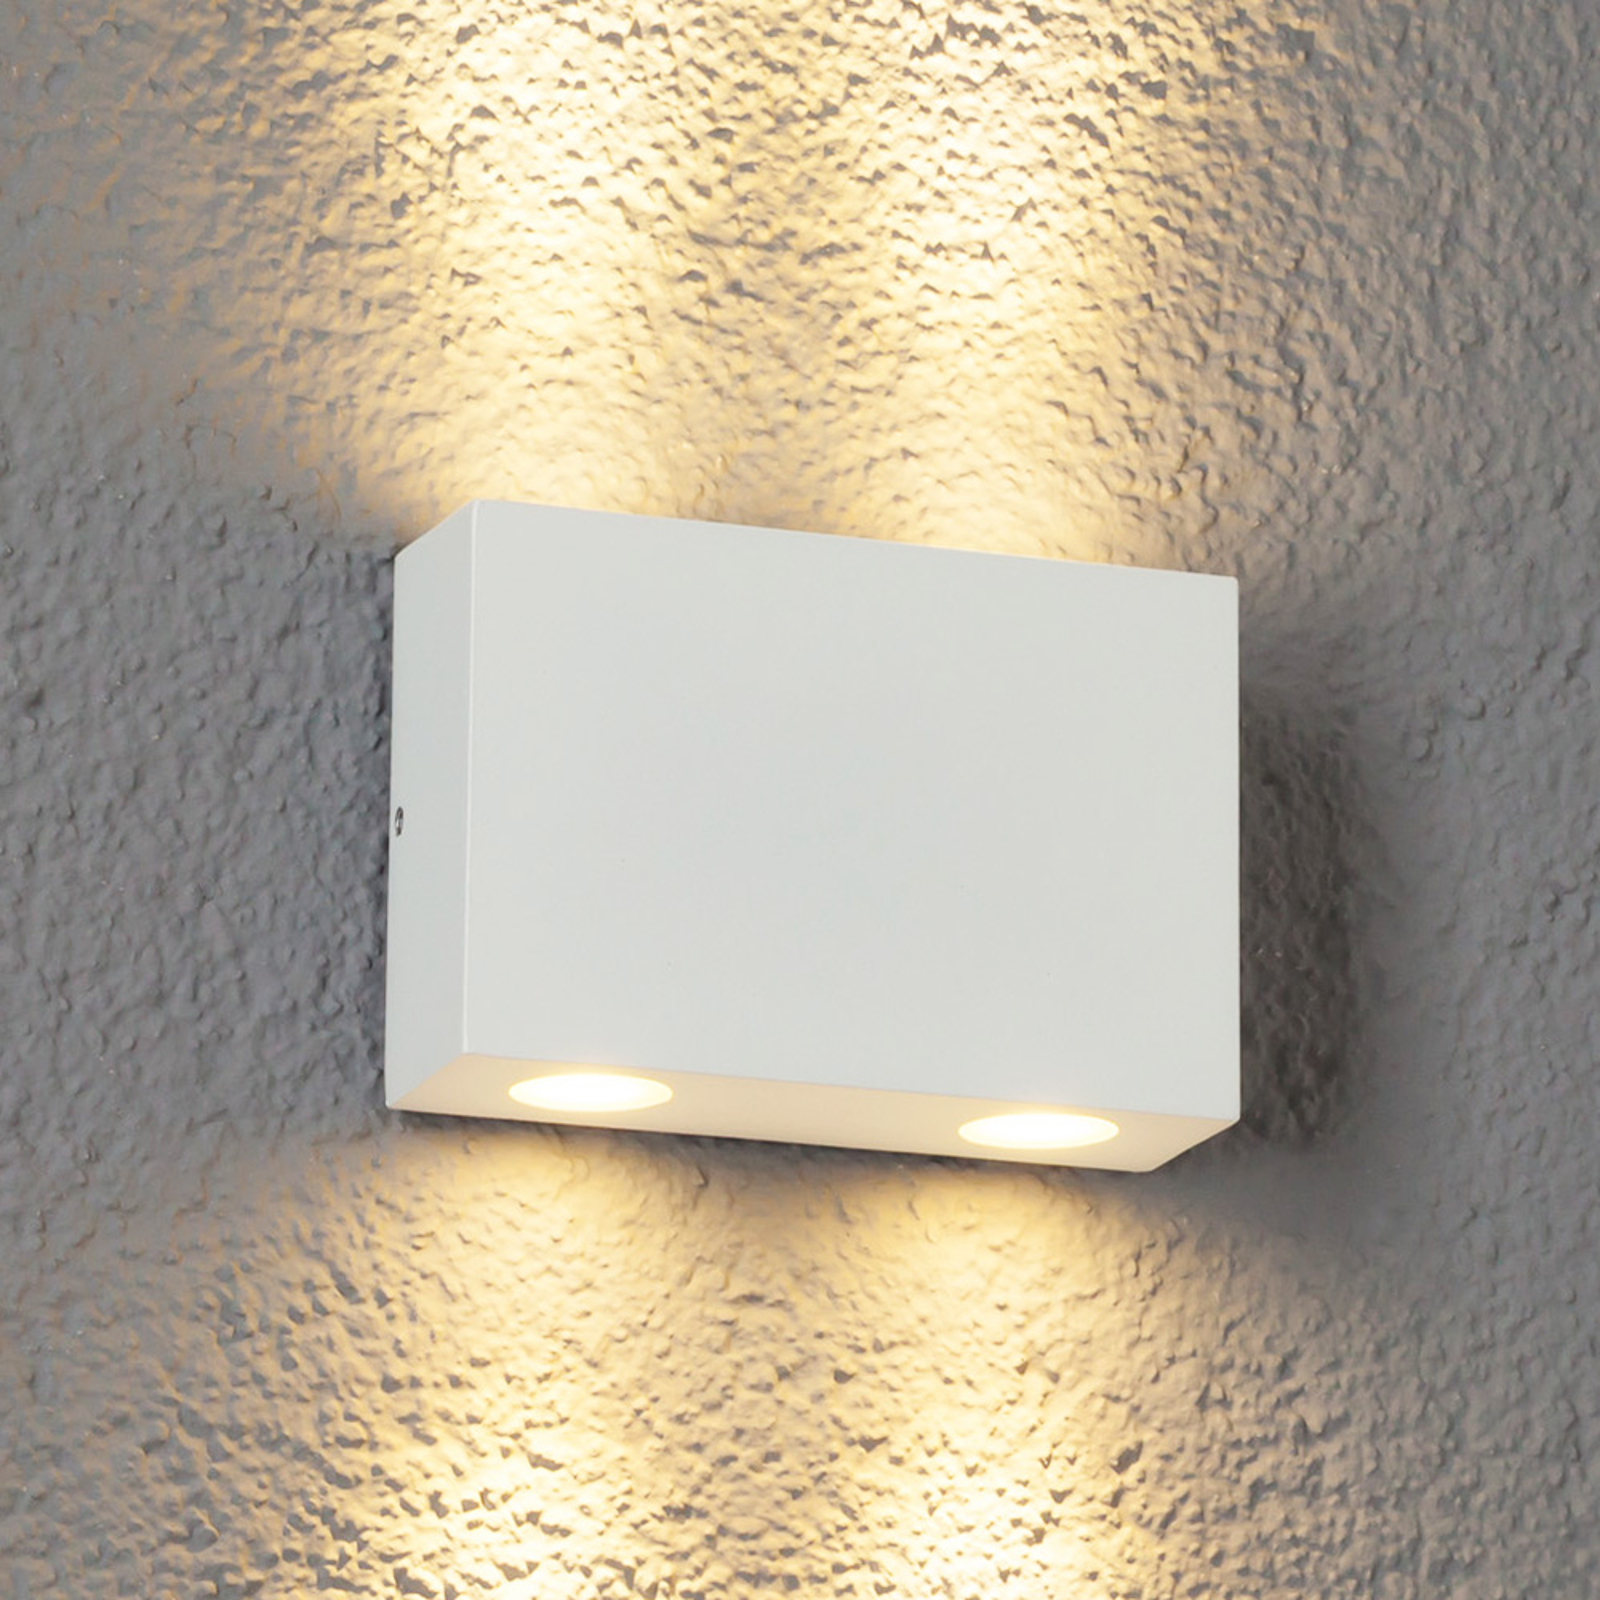 ApliqueLED exterioresHenor blanco 4 puntos luz